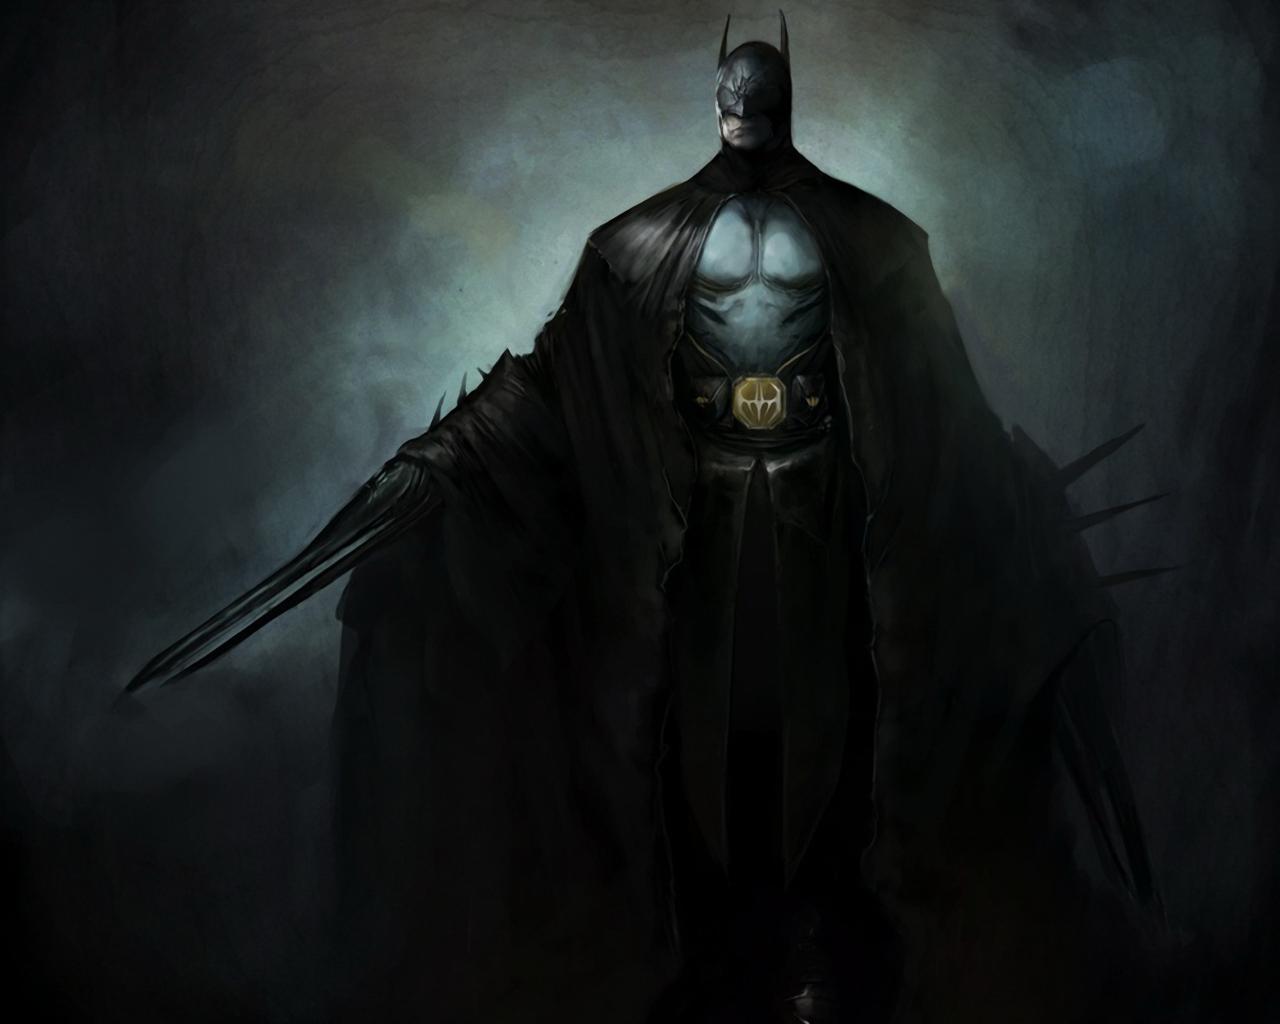 Batman desktop image Batman wallpapers 1280x1024